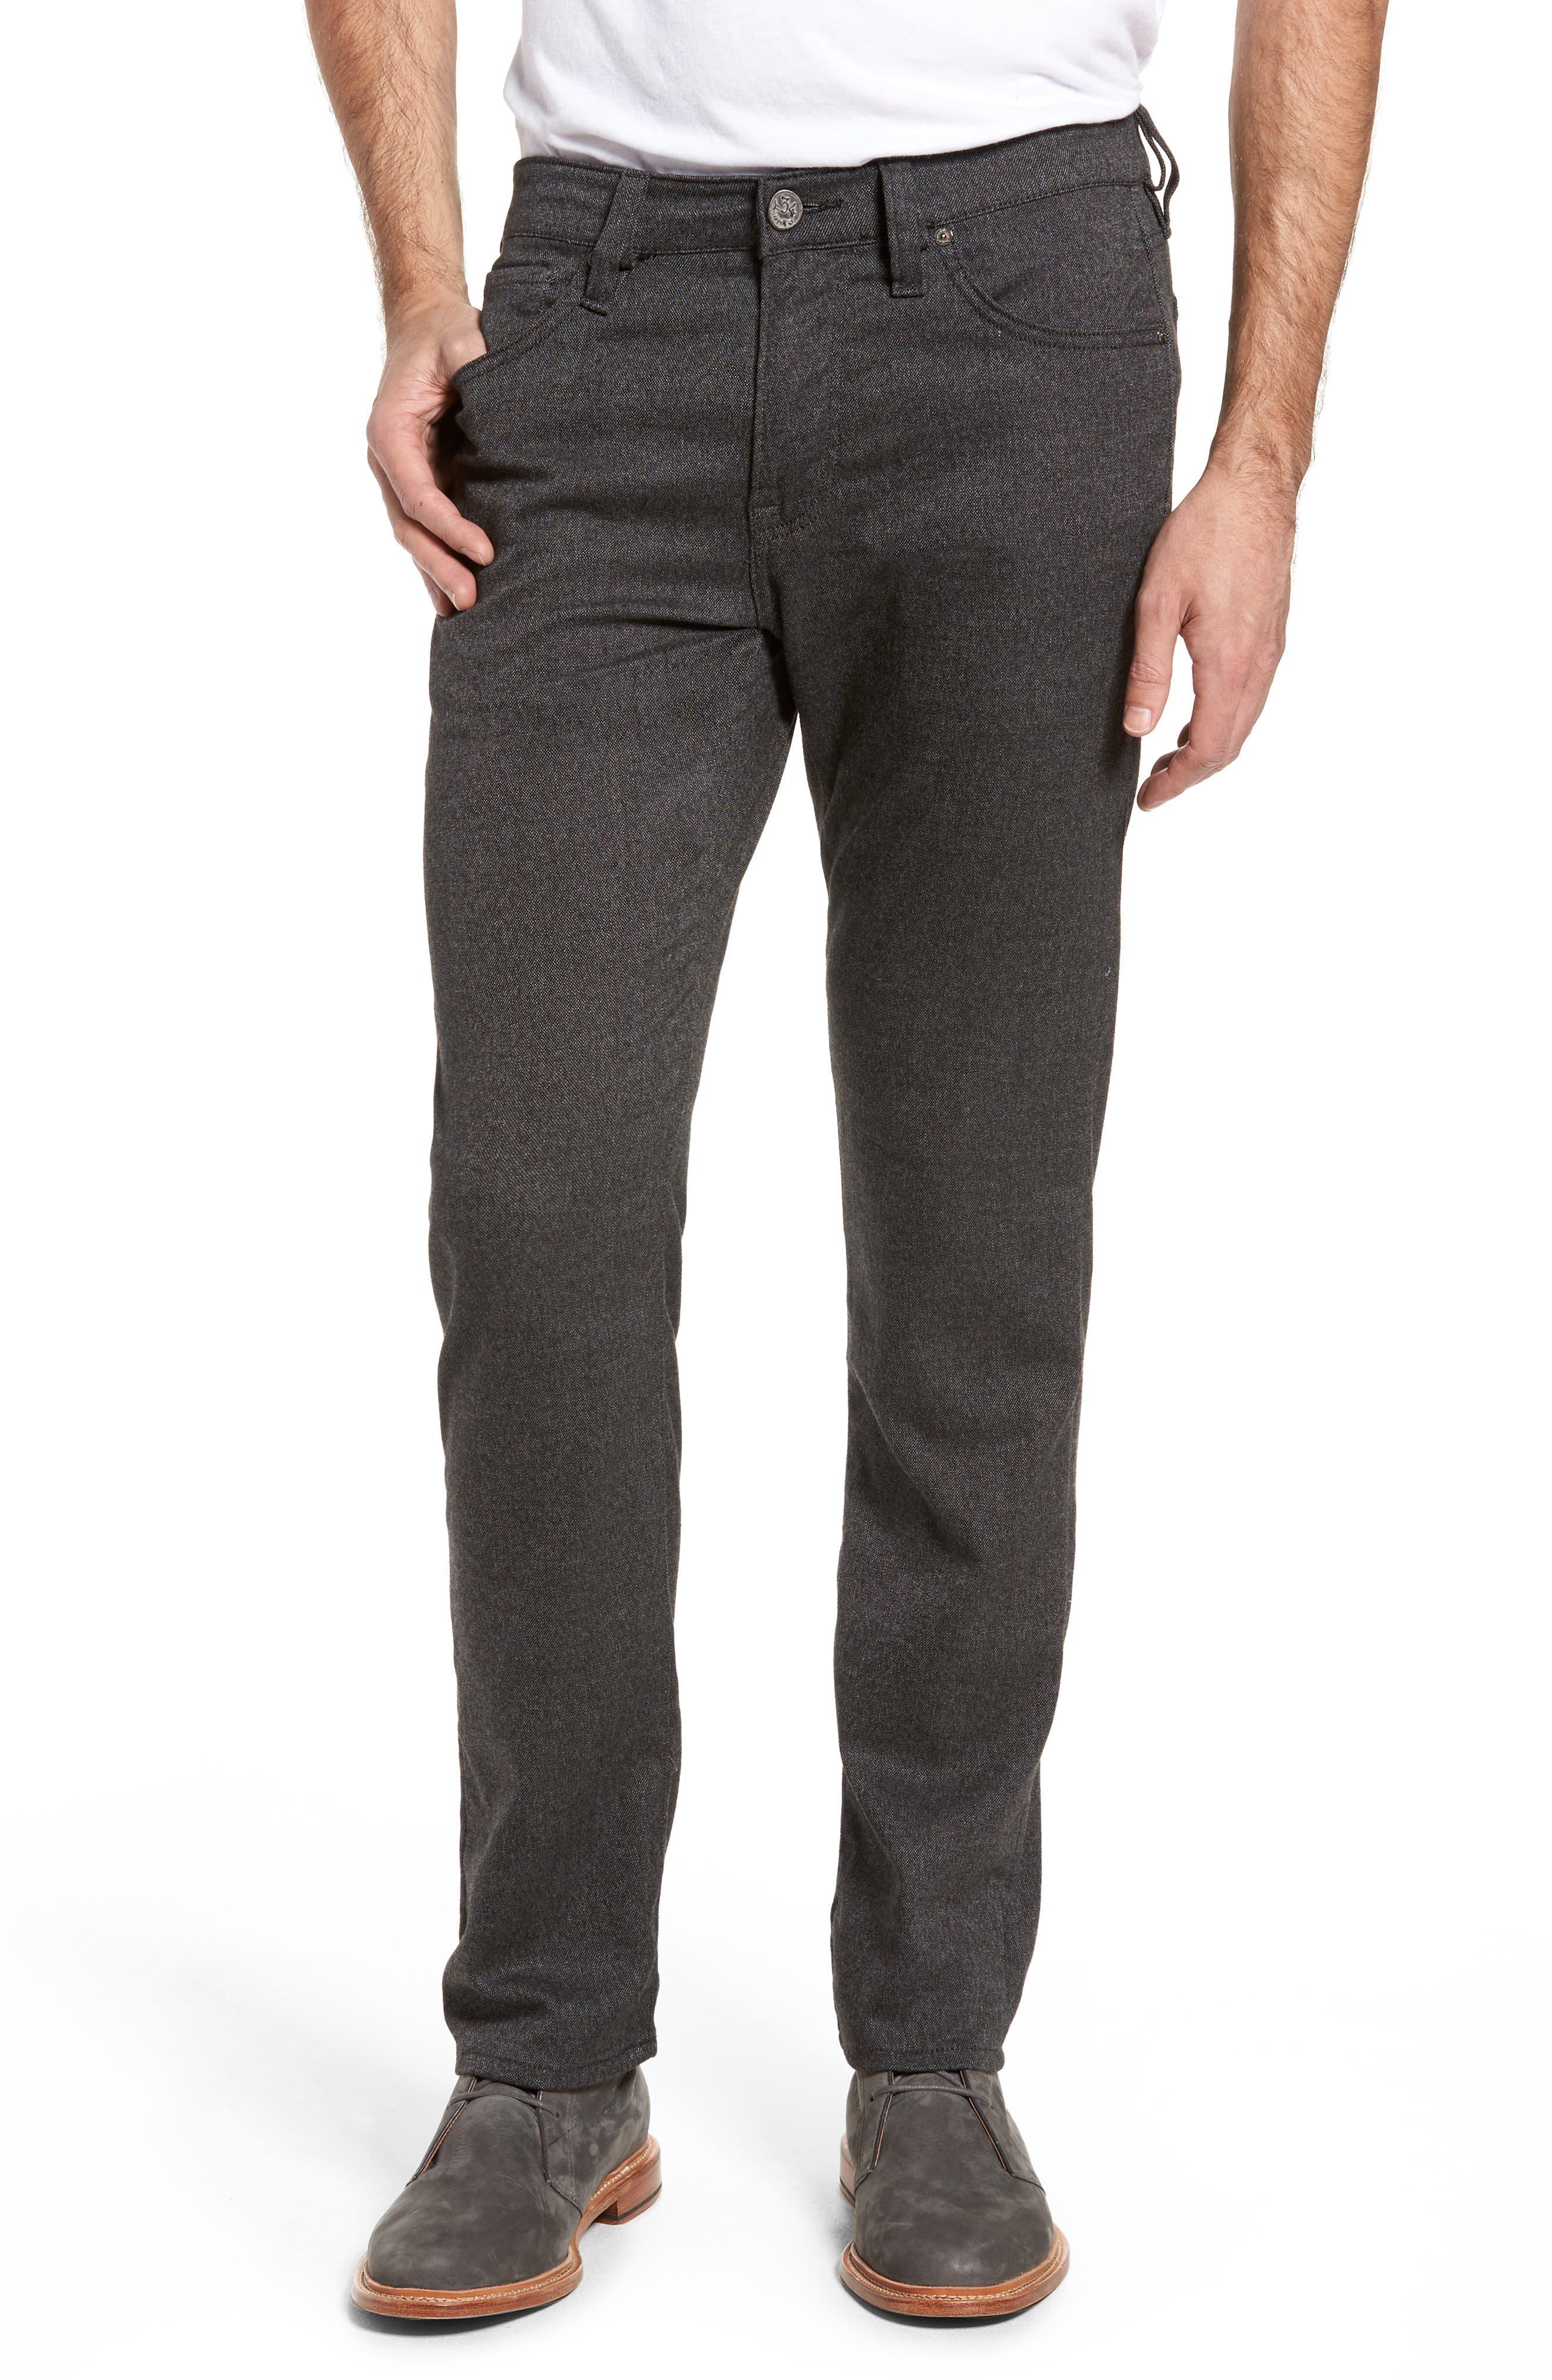 Courage Straight Leg Tweed Pants,                         Main,                         color, 020